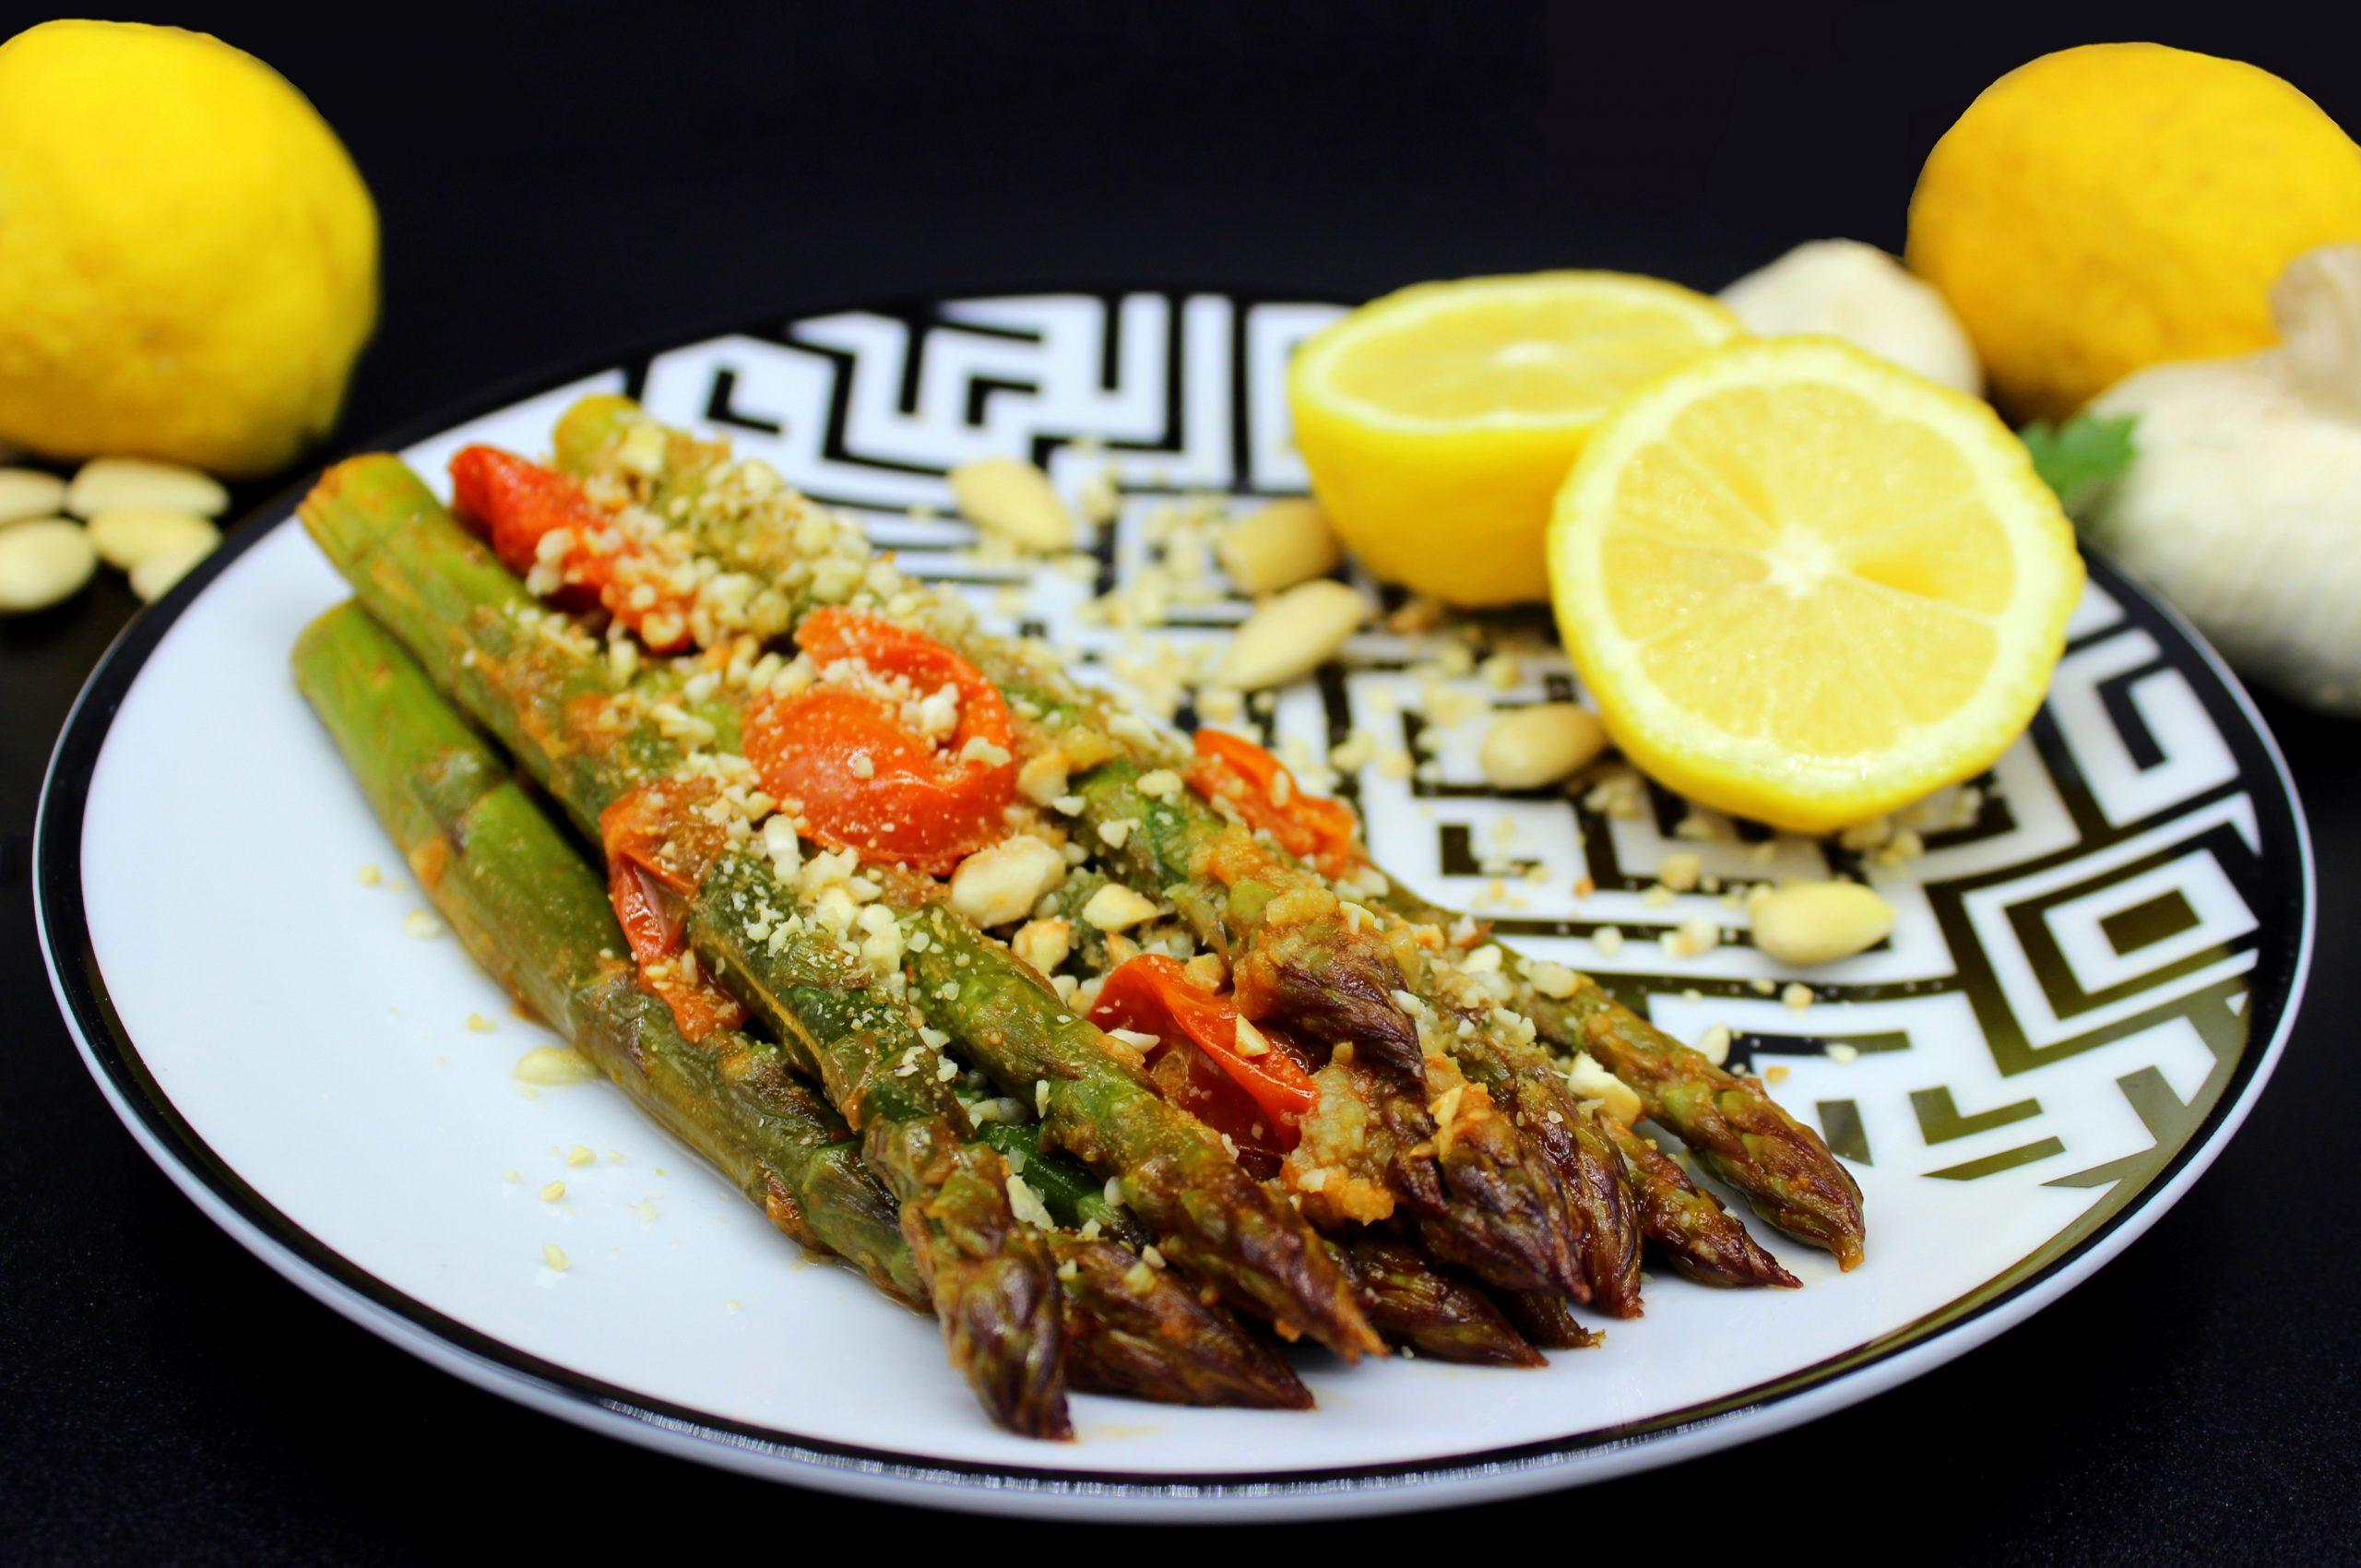 Delicious vegan side dish